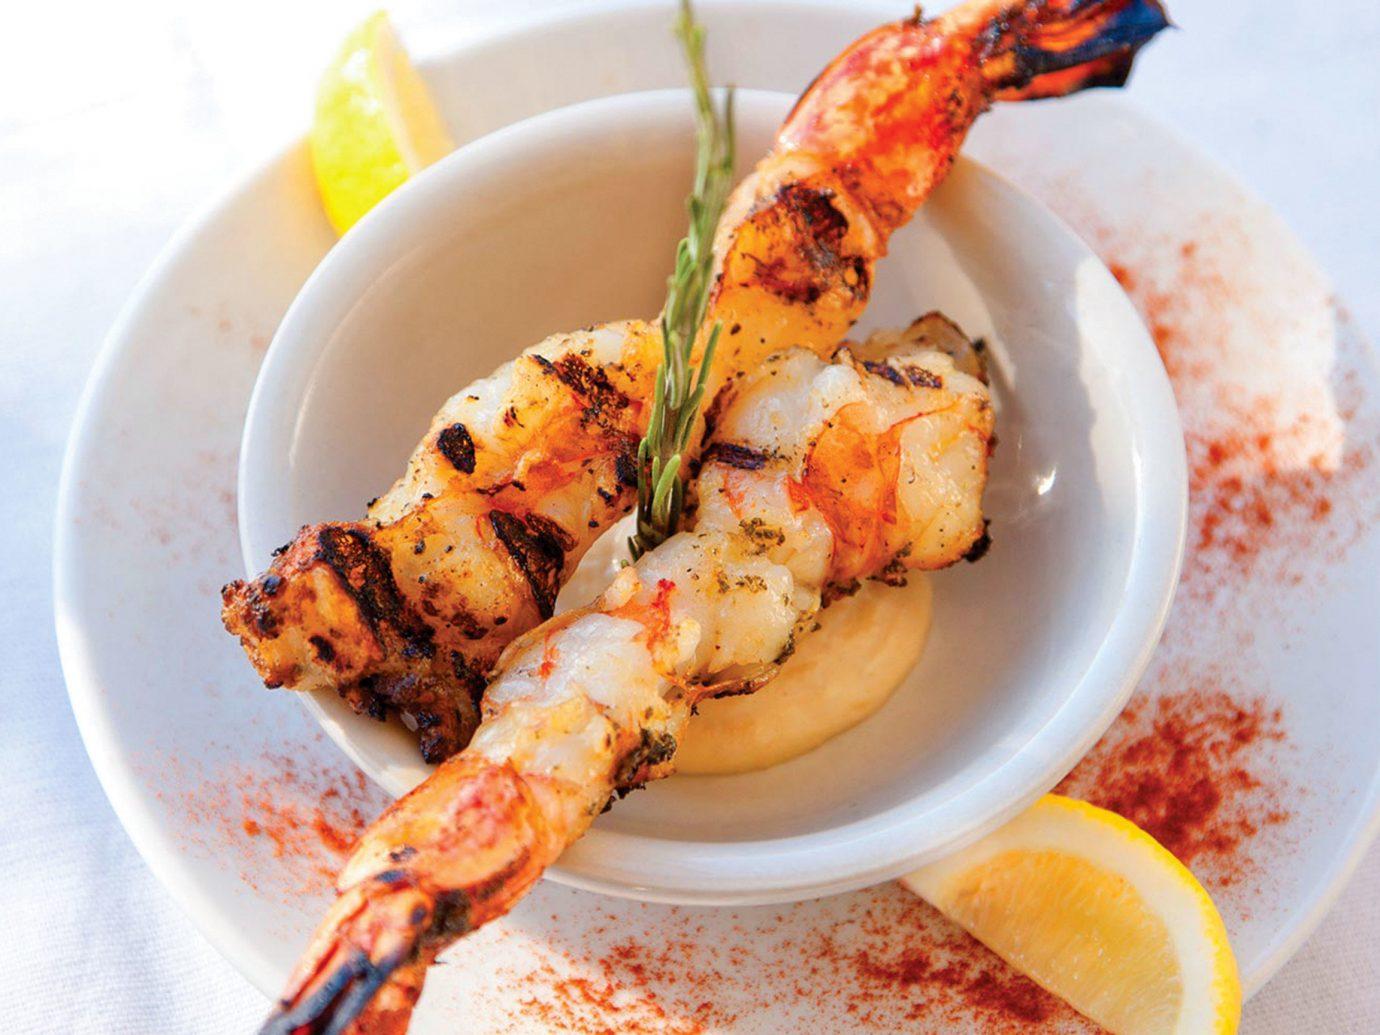 Trip Ideas plate food dish Seafood grilled food animal source foods shrimp brochette skewer satay scampi recipe souvlaki greek food cuisine mediterranean food kebab